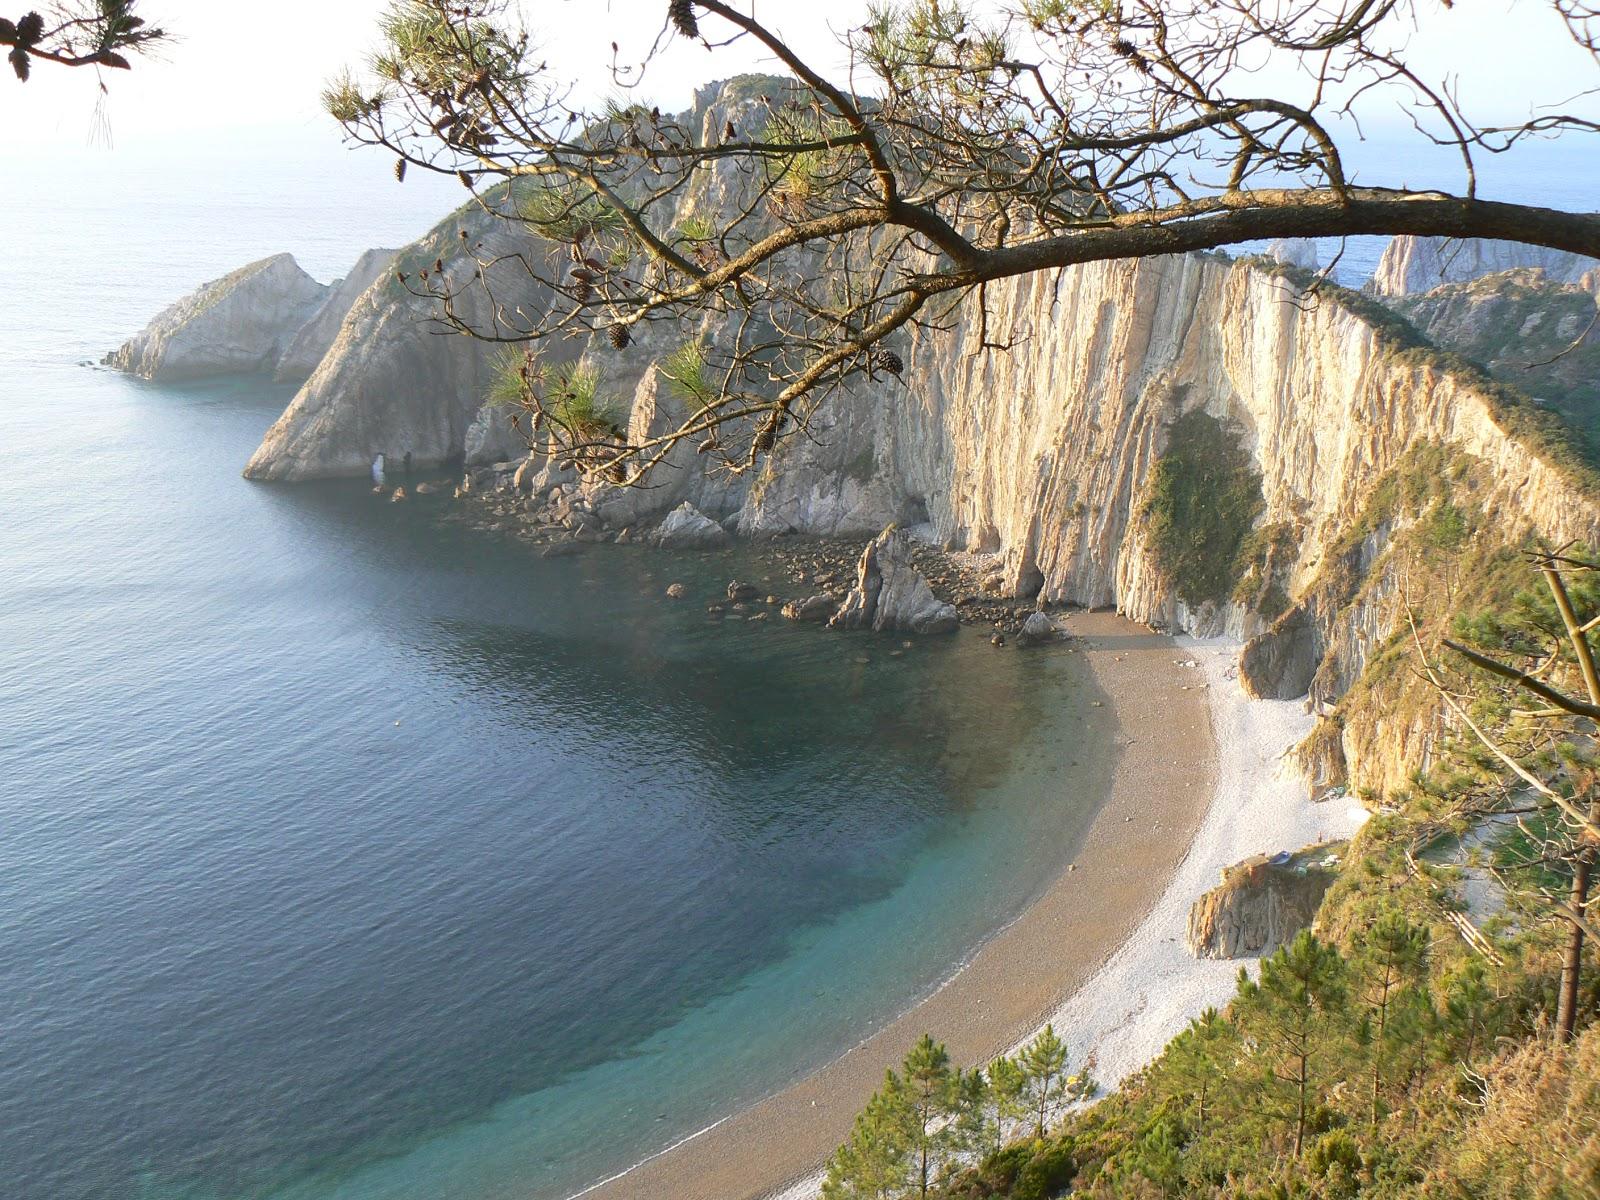 Playa Regueira